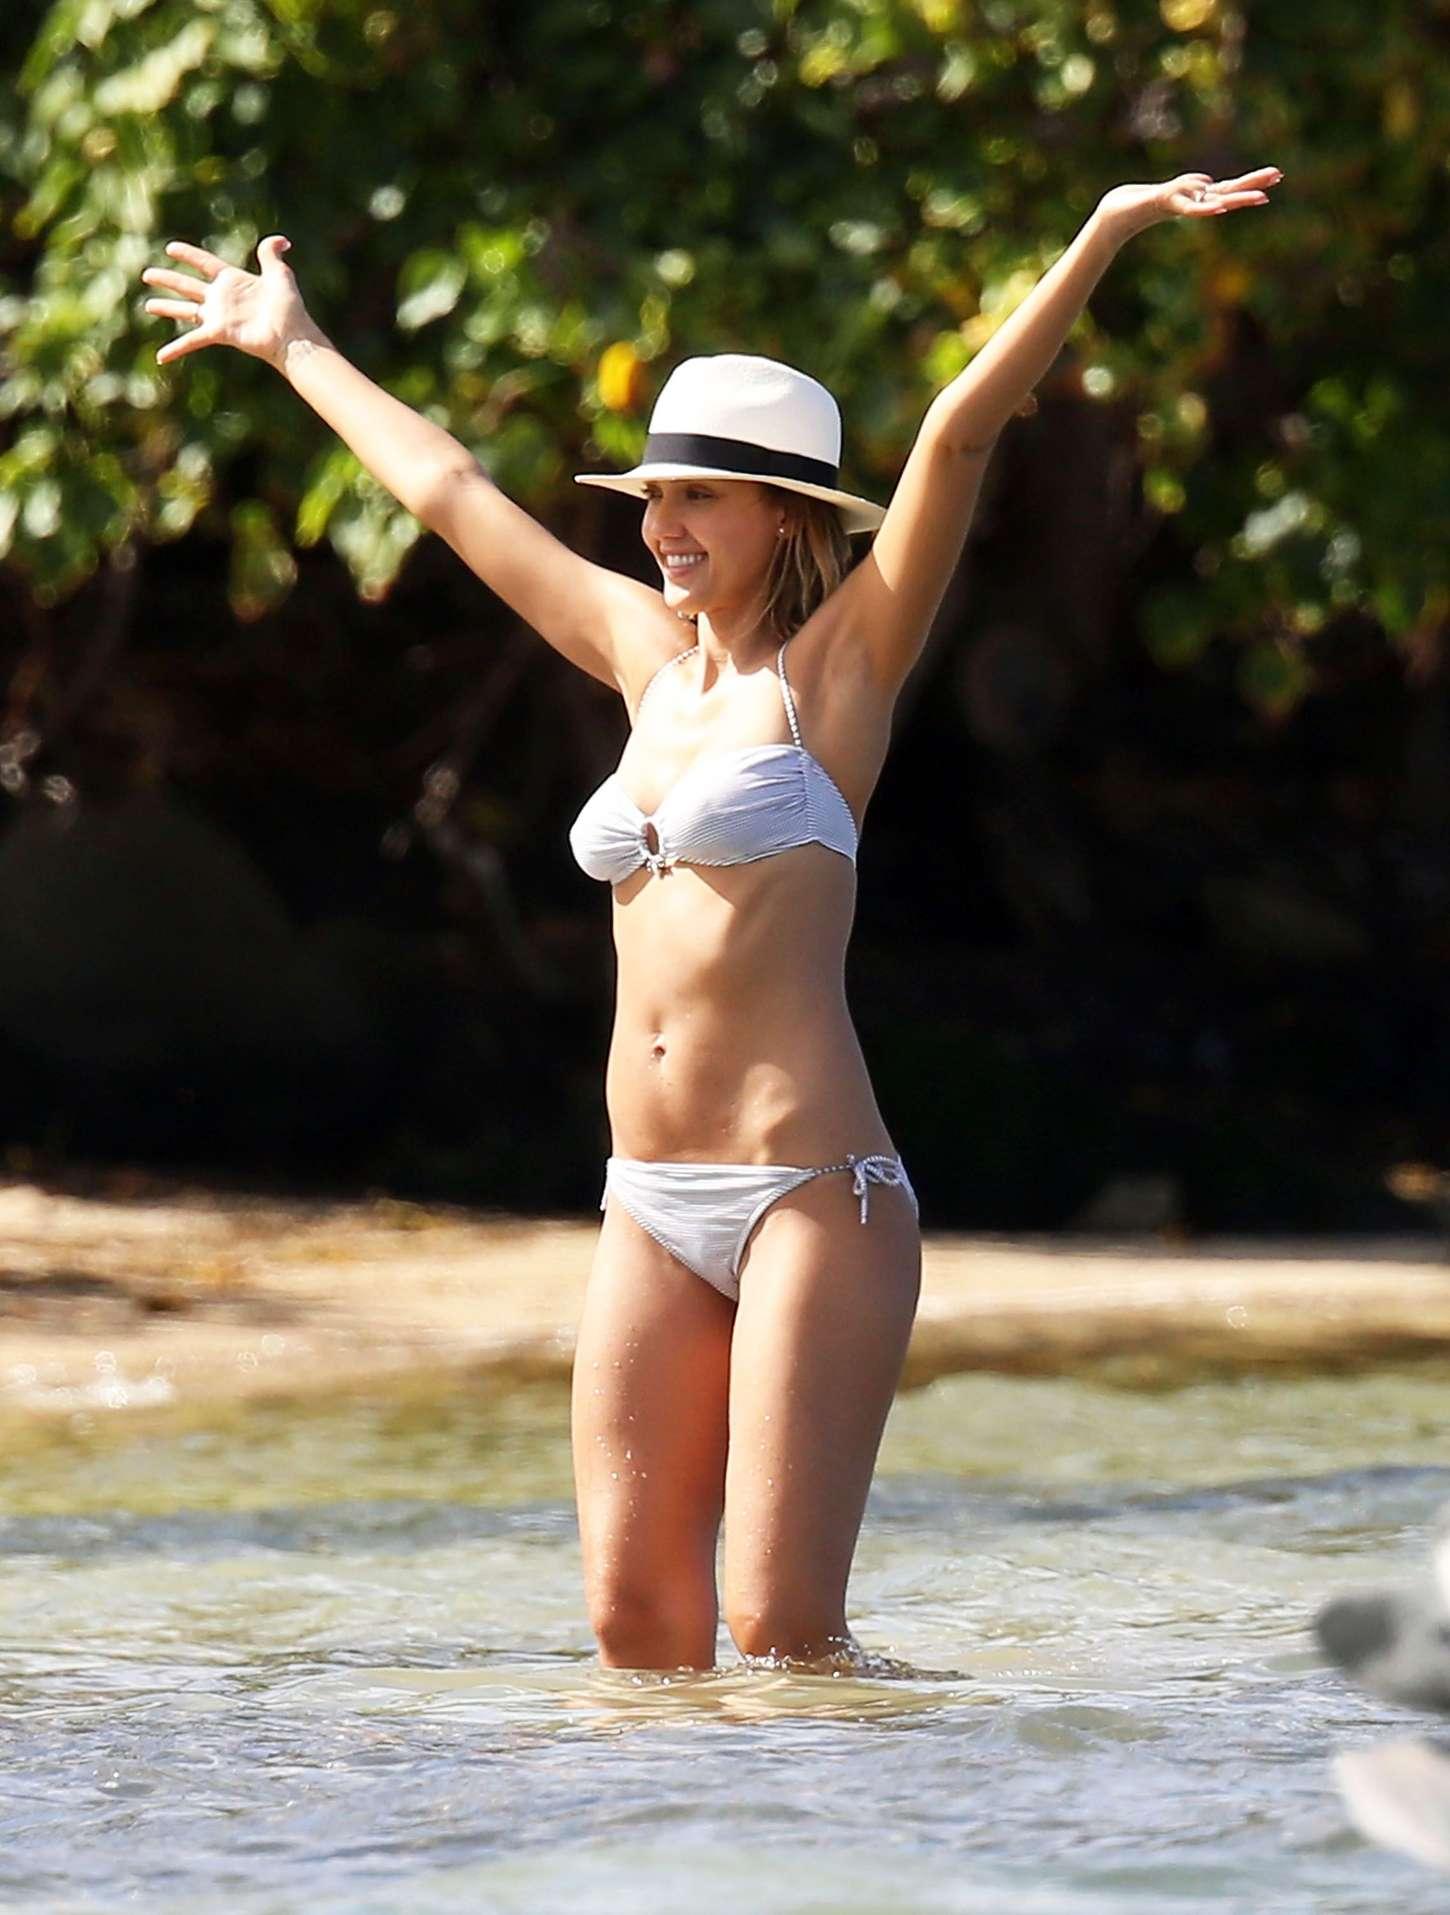 Jessica-Alba-in-Bikini--04.jpg